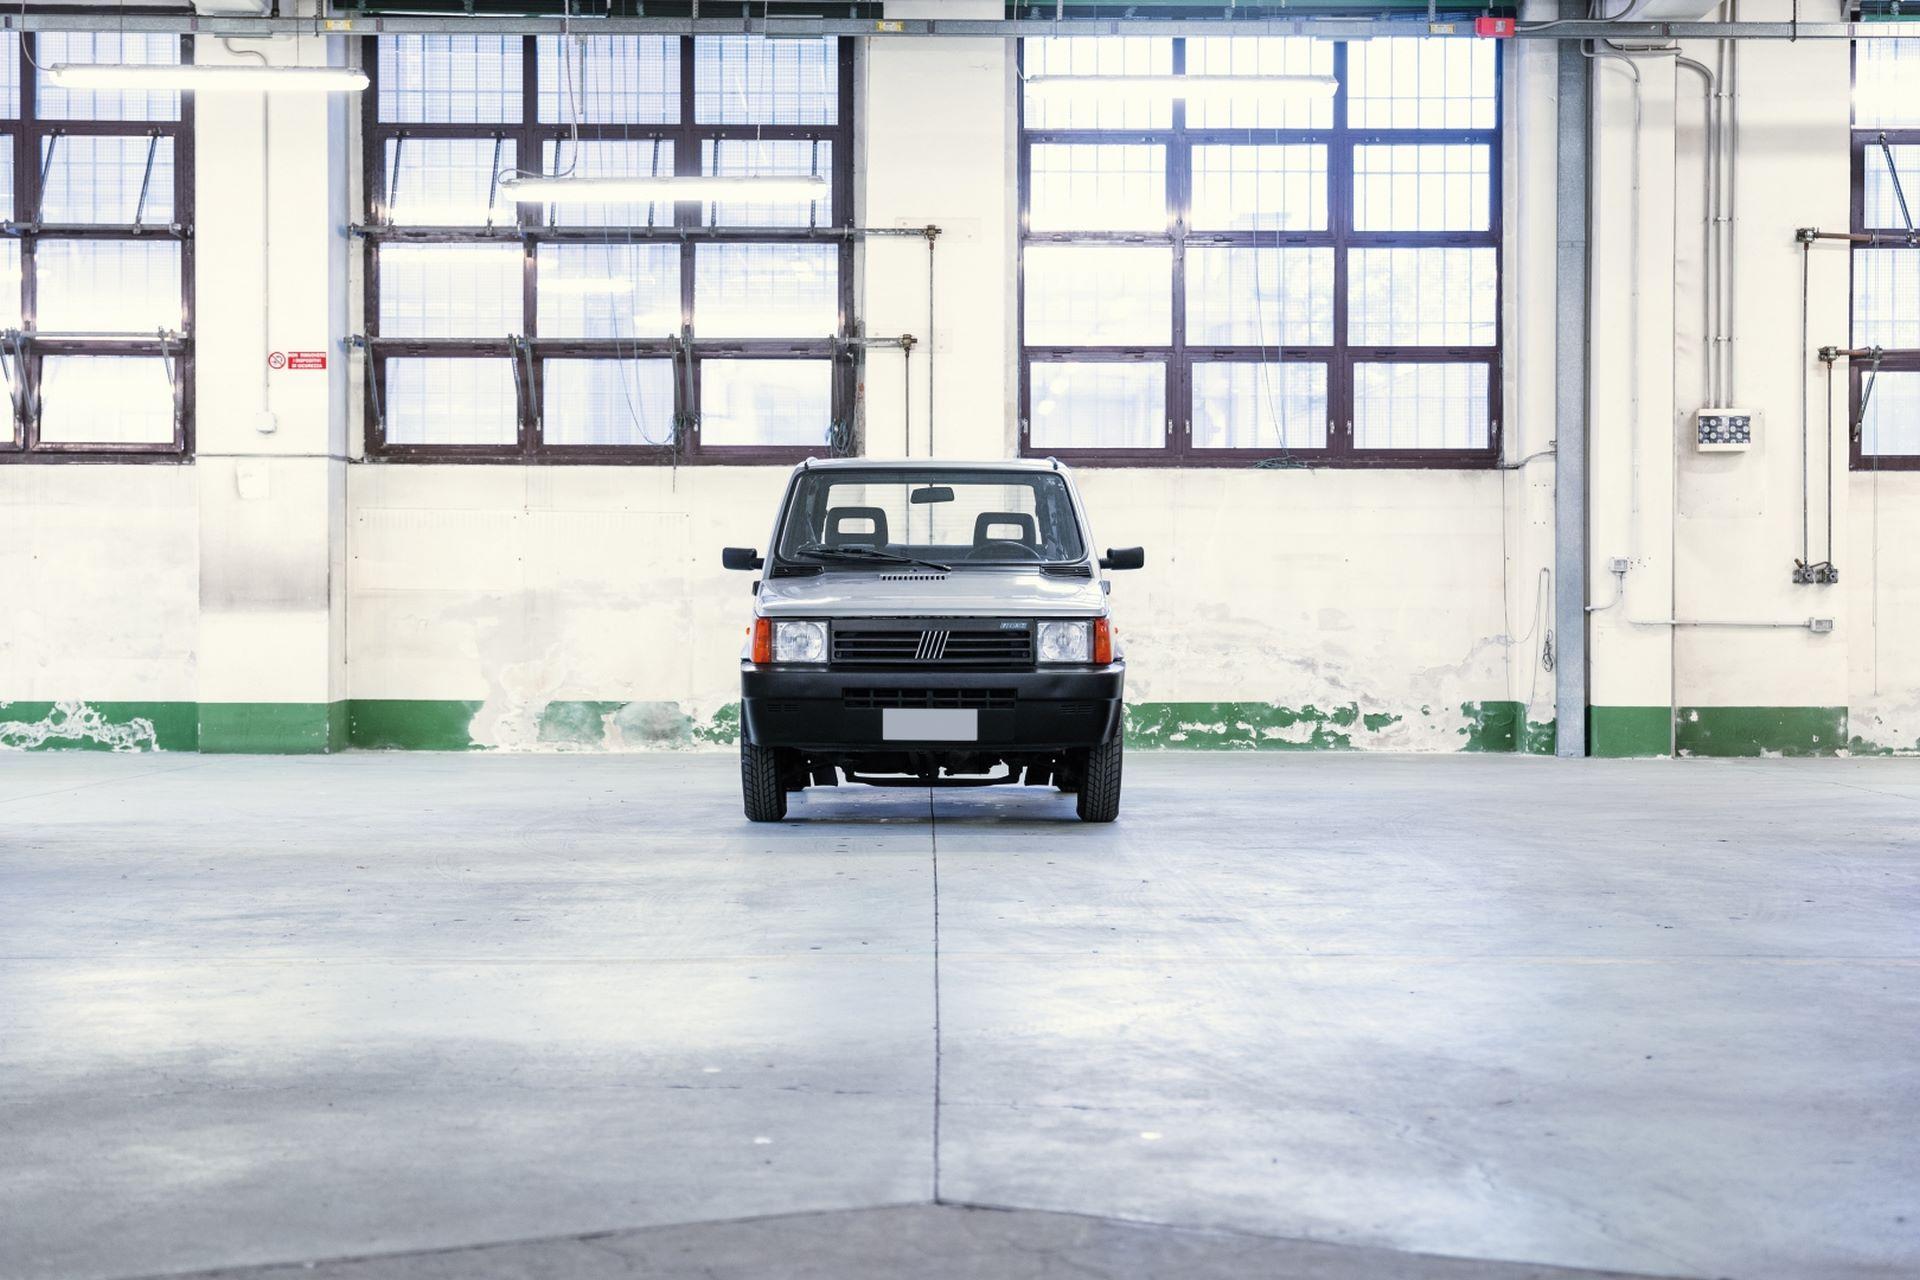 Fiat-Panda-Gianni-Agnelli-auction-2